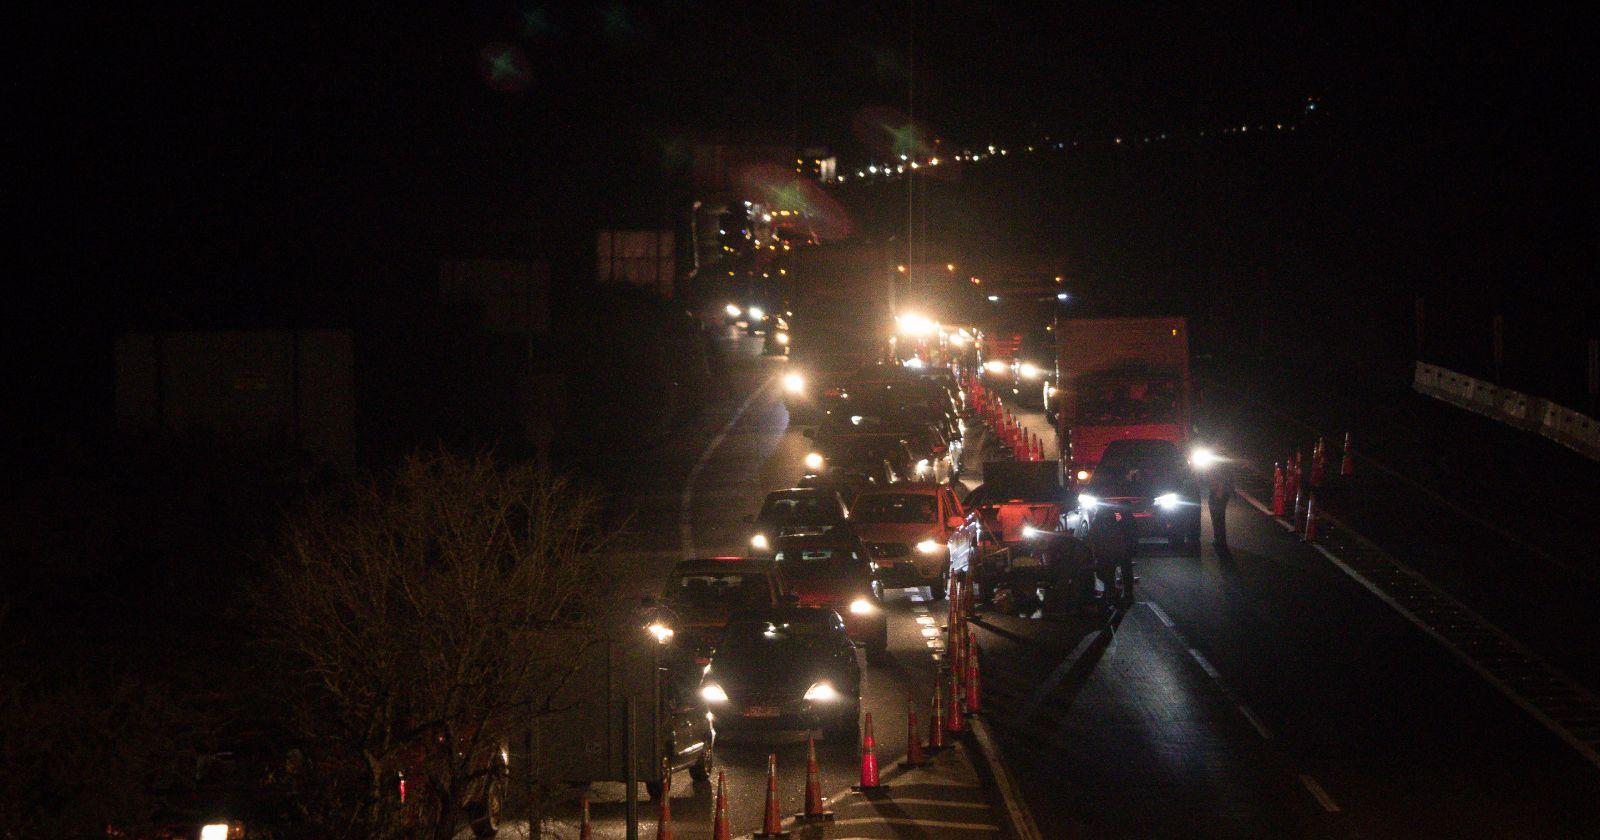 Masiva fuga de capitalinos a la costa para evitar cuarentena en Santiago